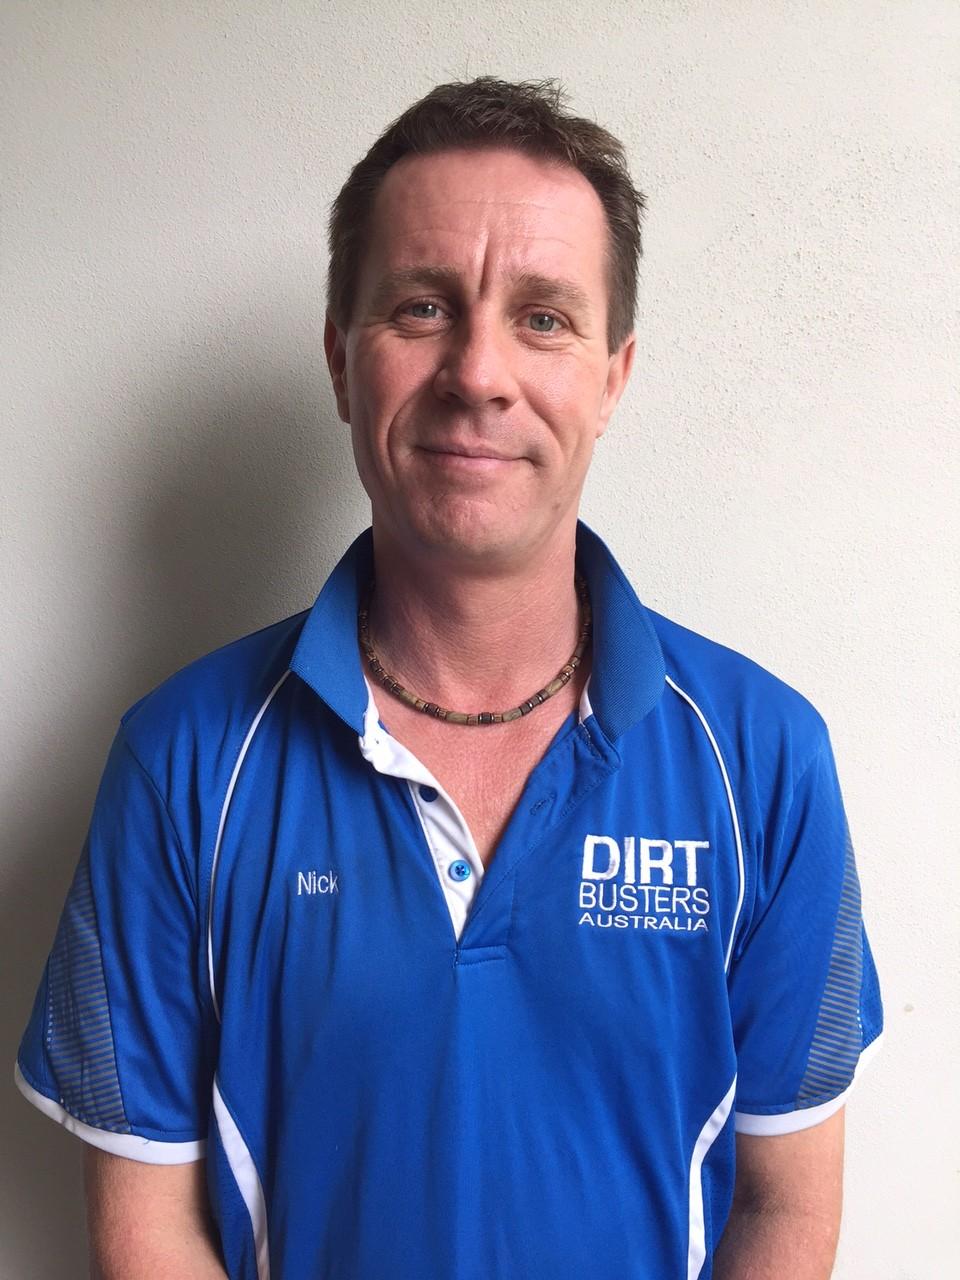 Nick. Owner Of Dirt Busters Mobile Car Detailing